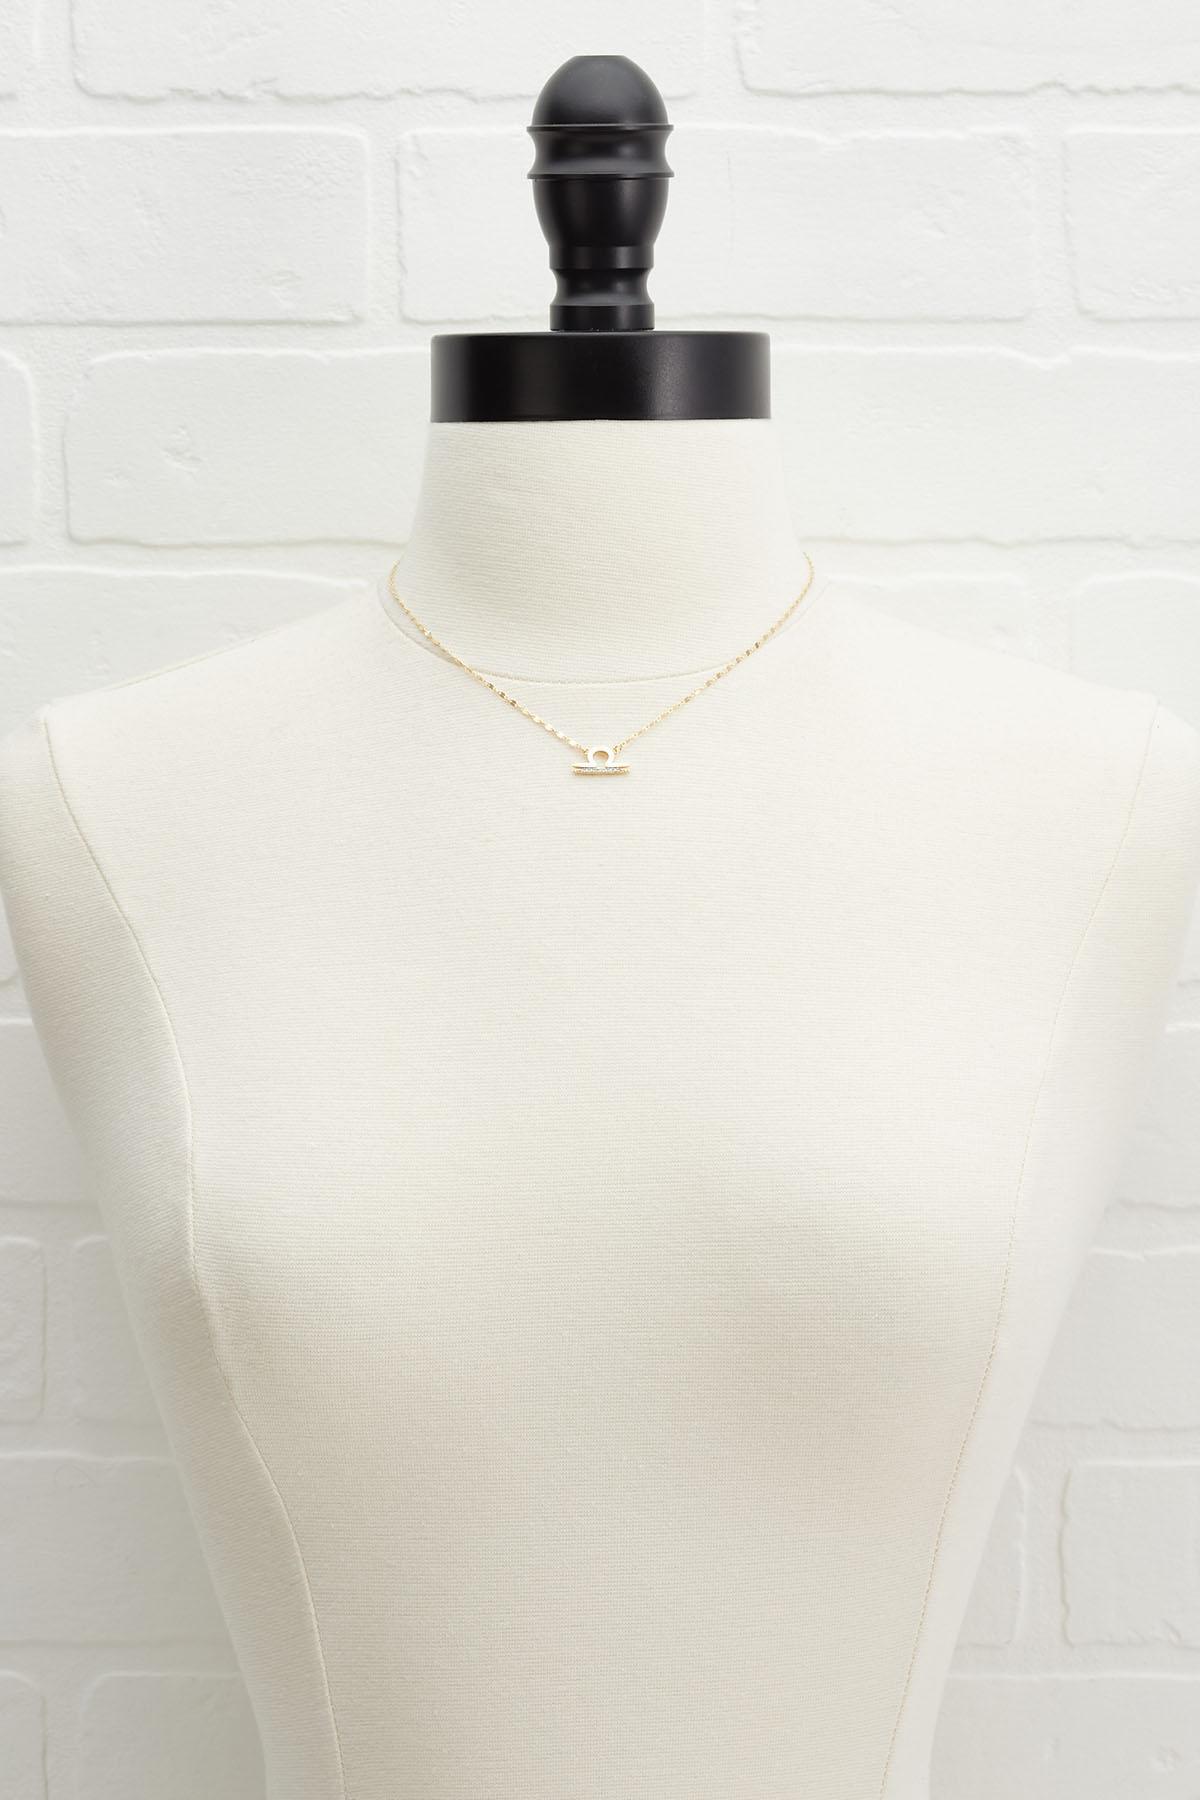 18k Libra Necklace